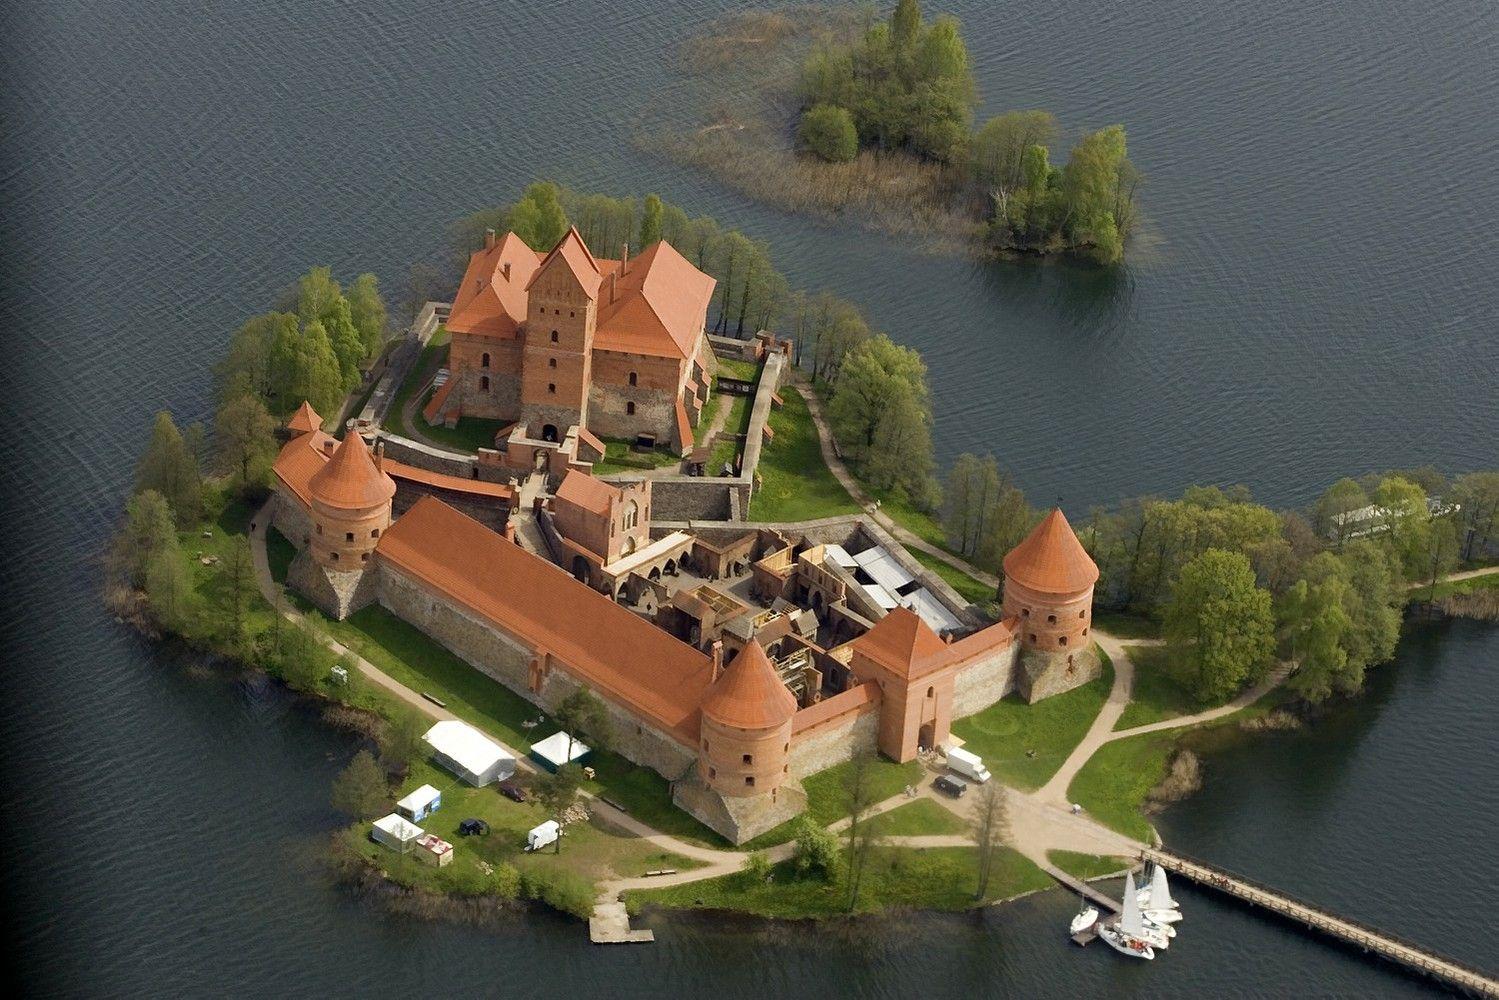 Lankomiausi muziejai Lietuvoje